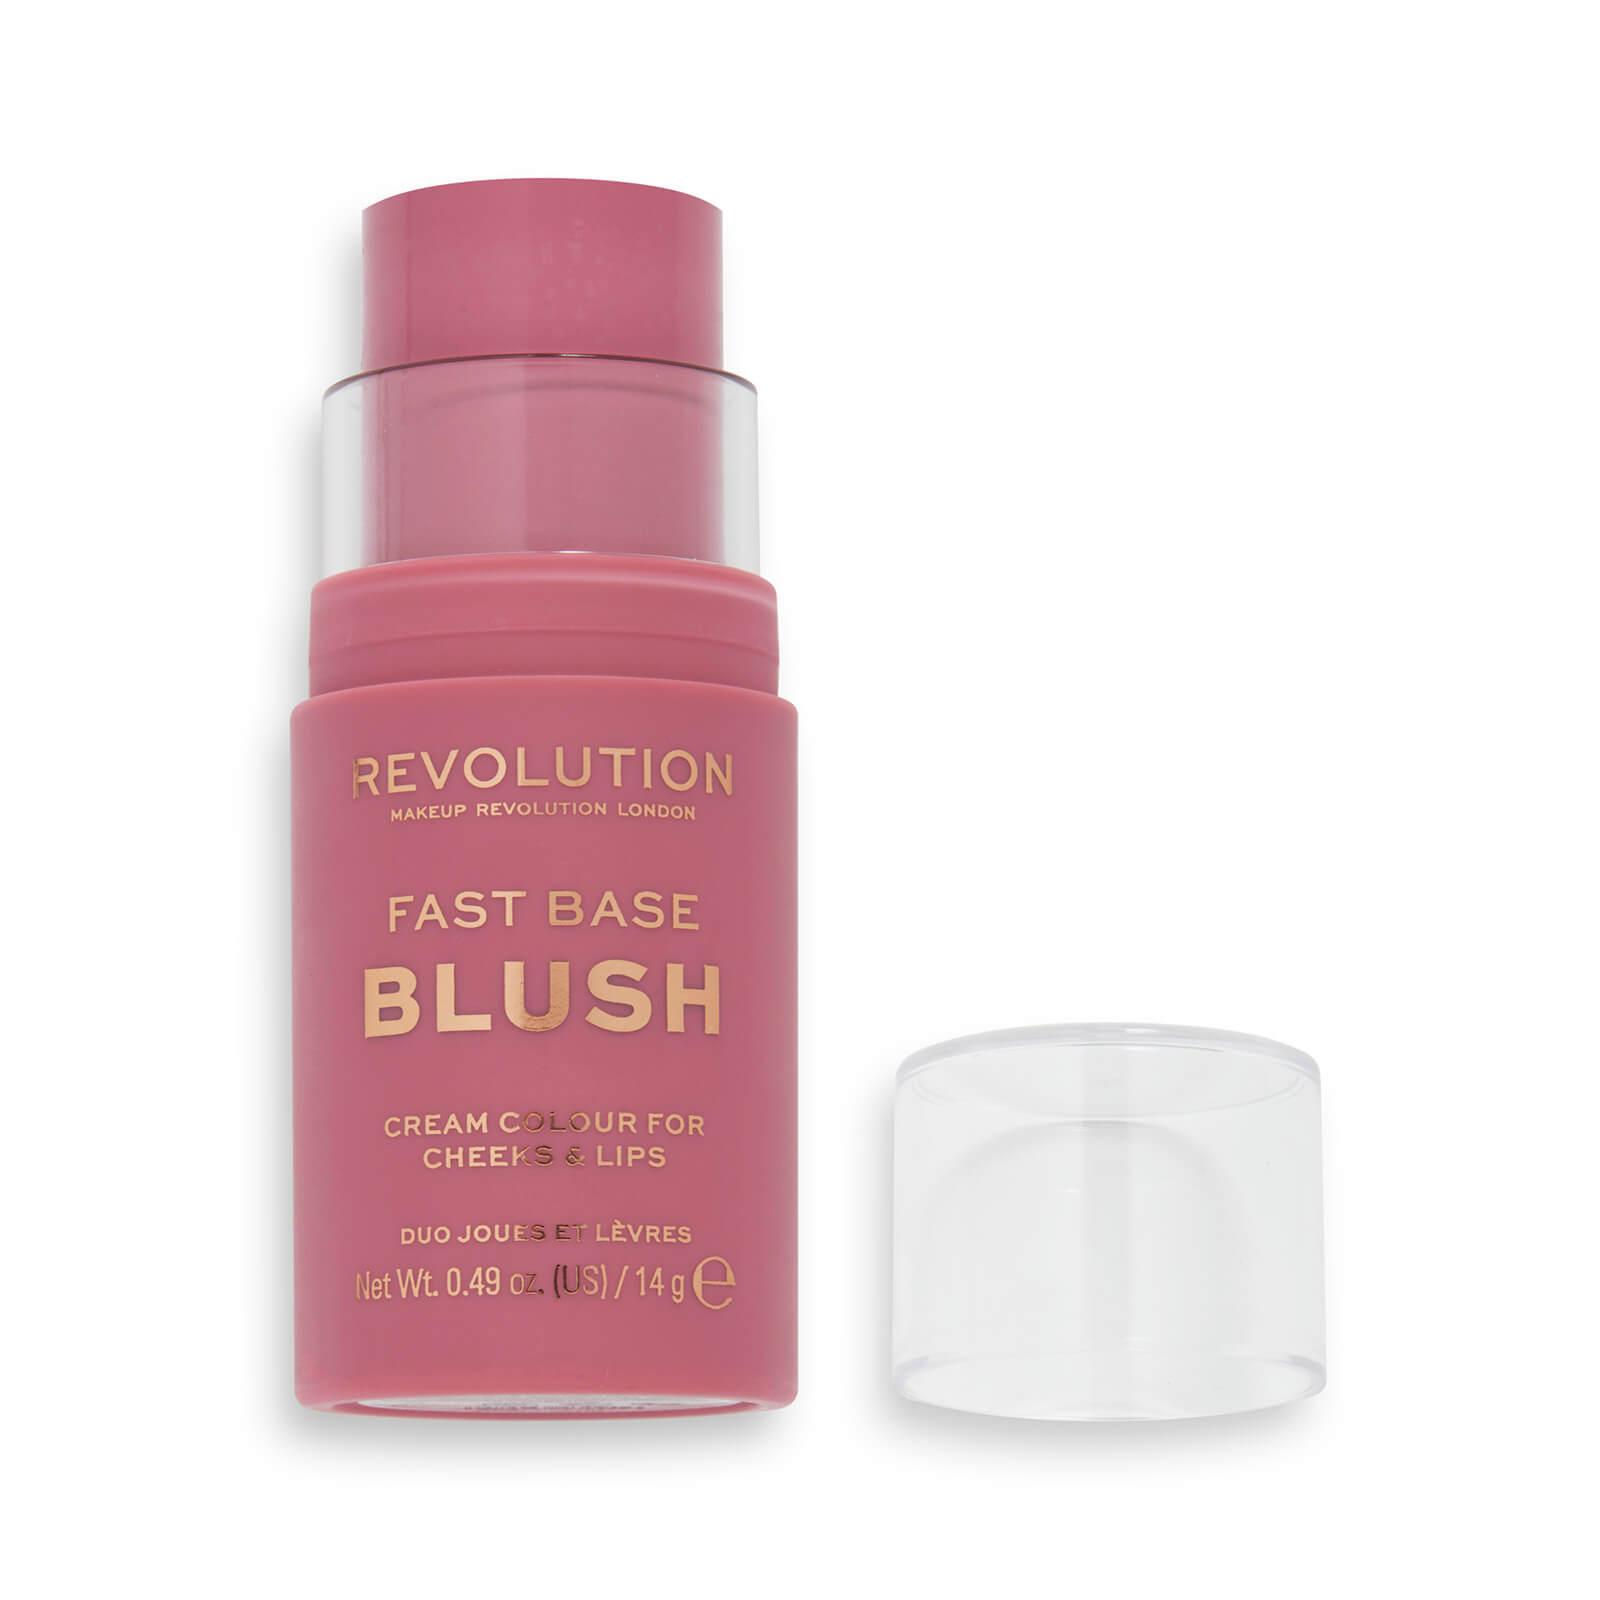 Купить Revolution Fast Base Blush Stick 14g (Various Shades) - Blush